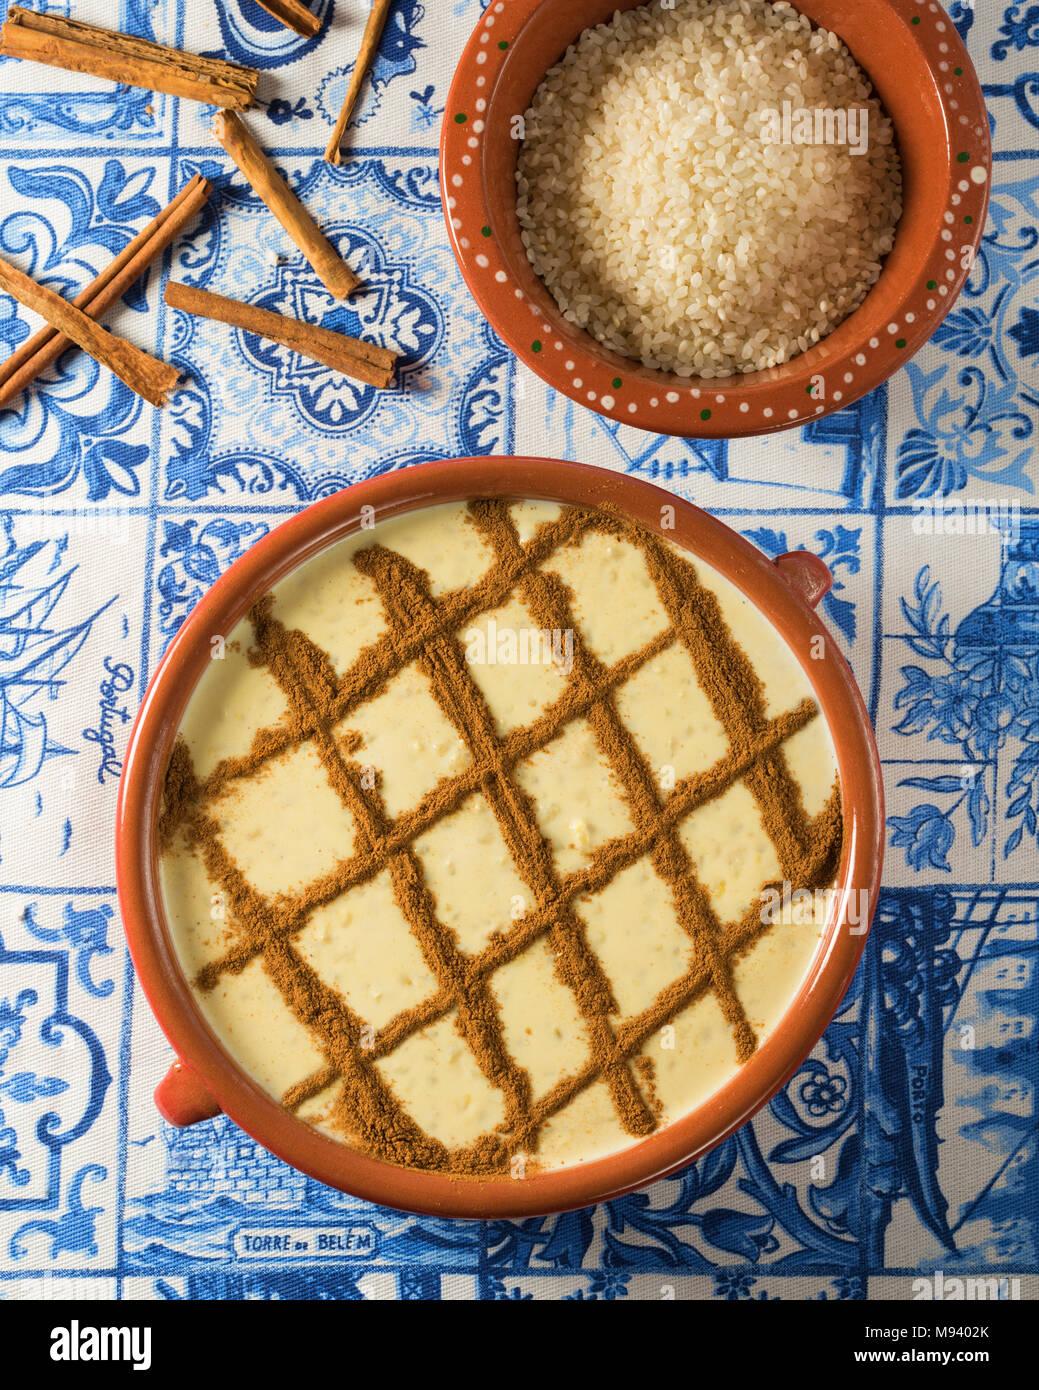 Arroz doce. Portuguese rice pudding. Portugal Food - Stock Image